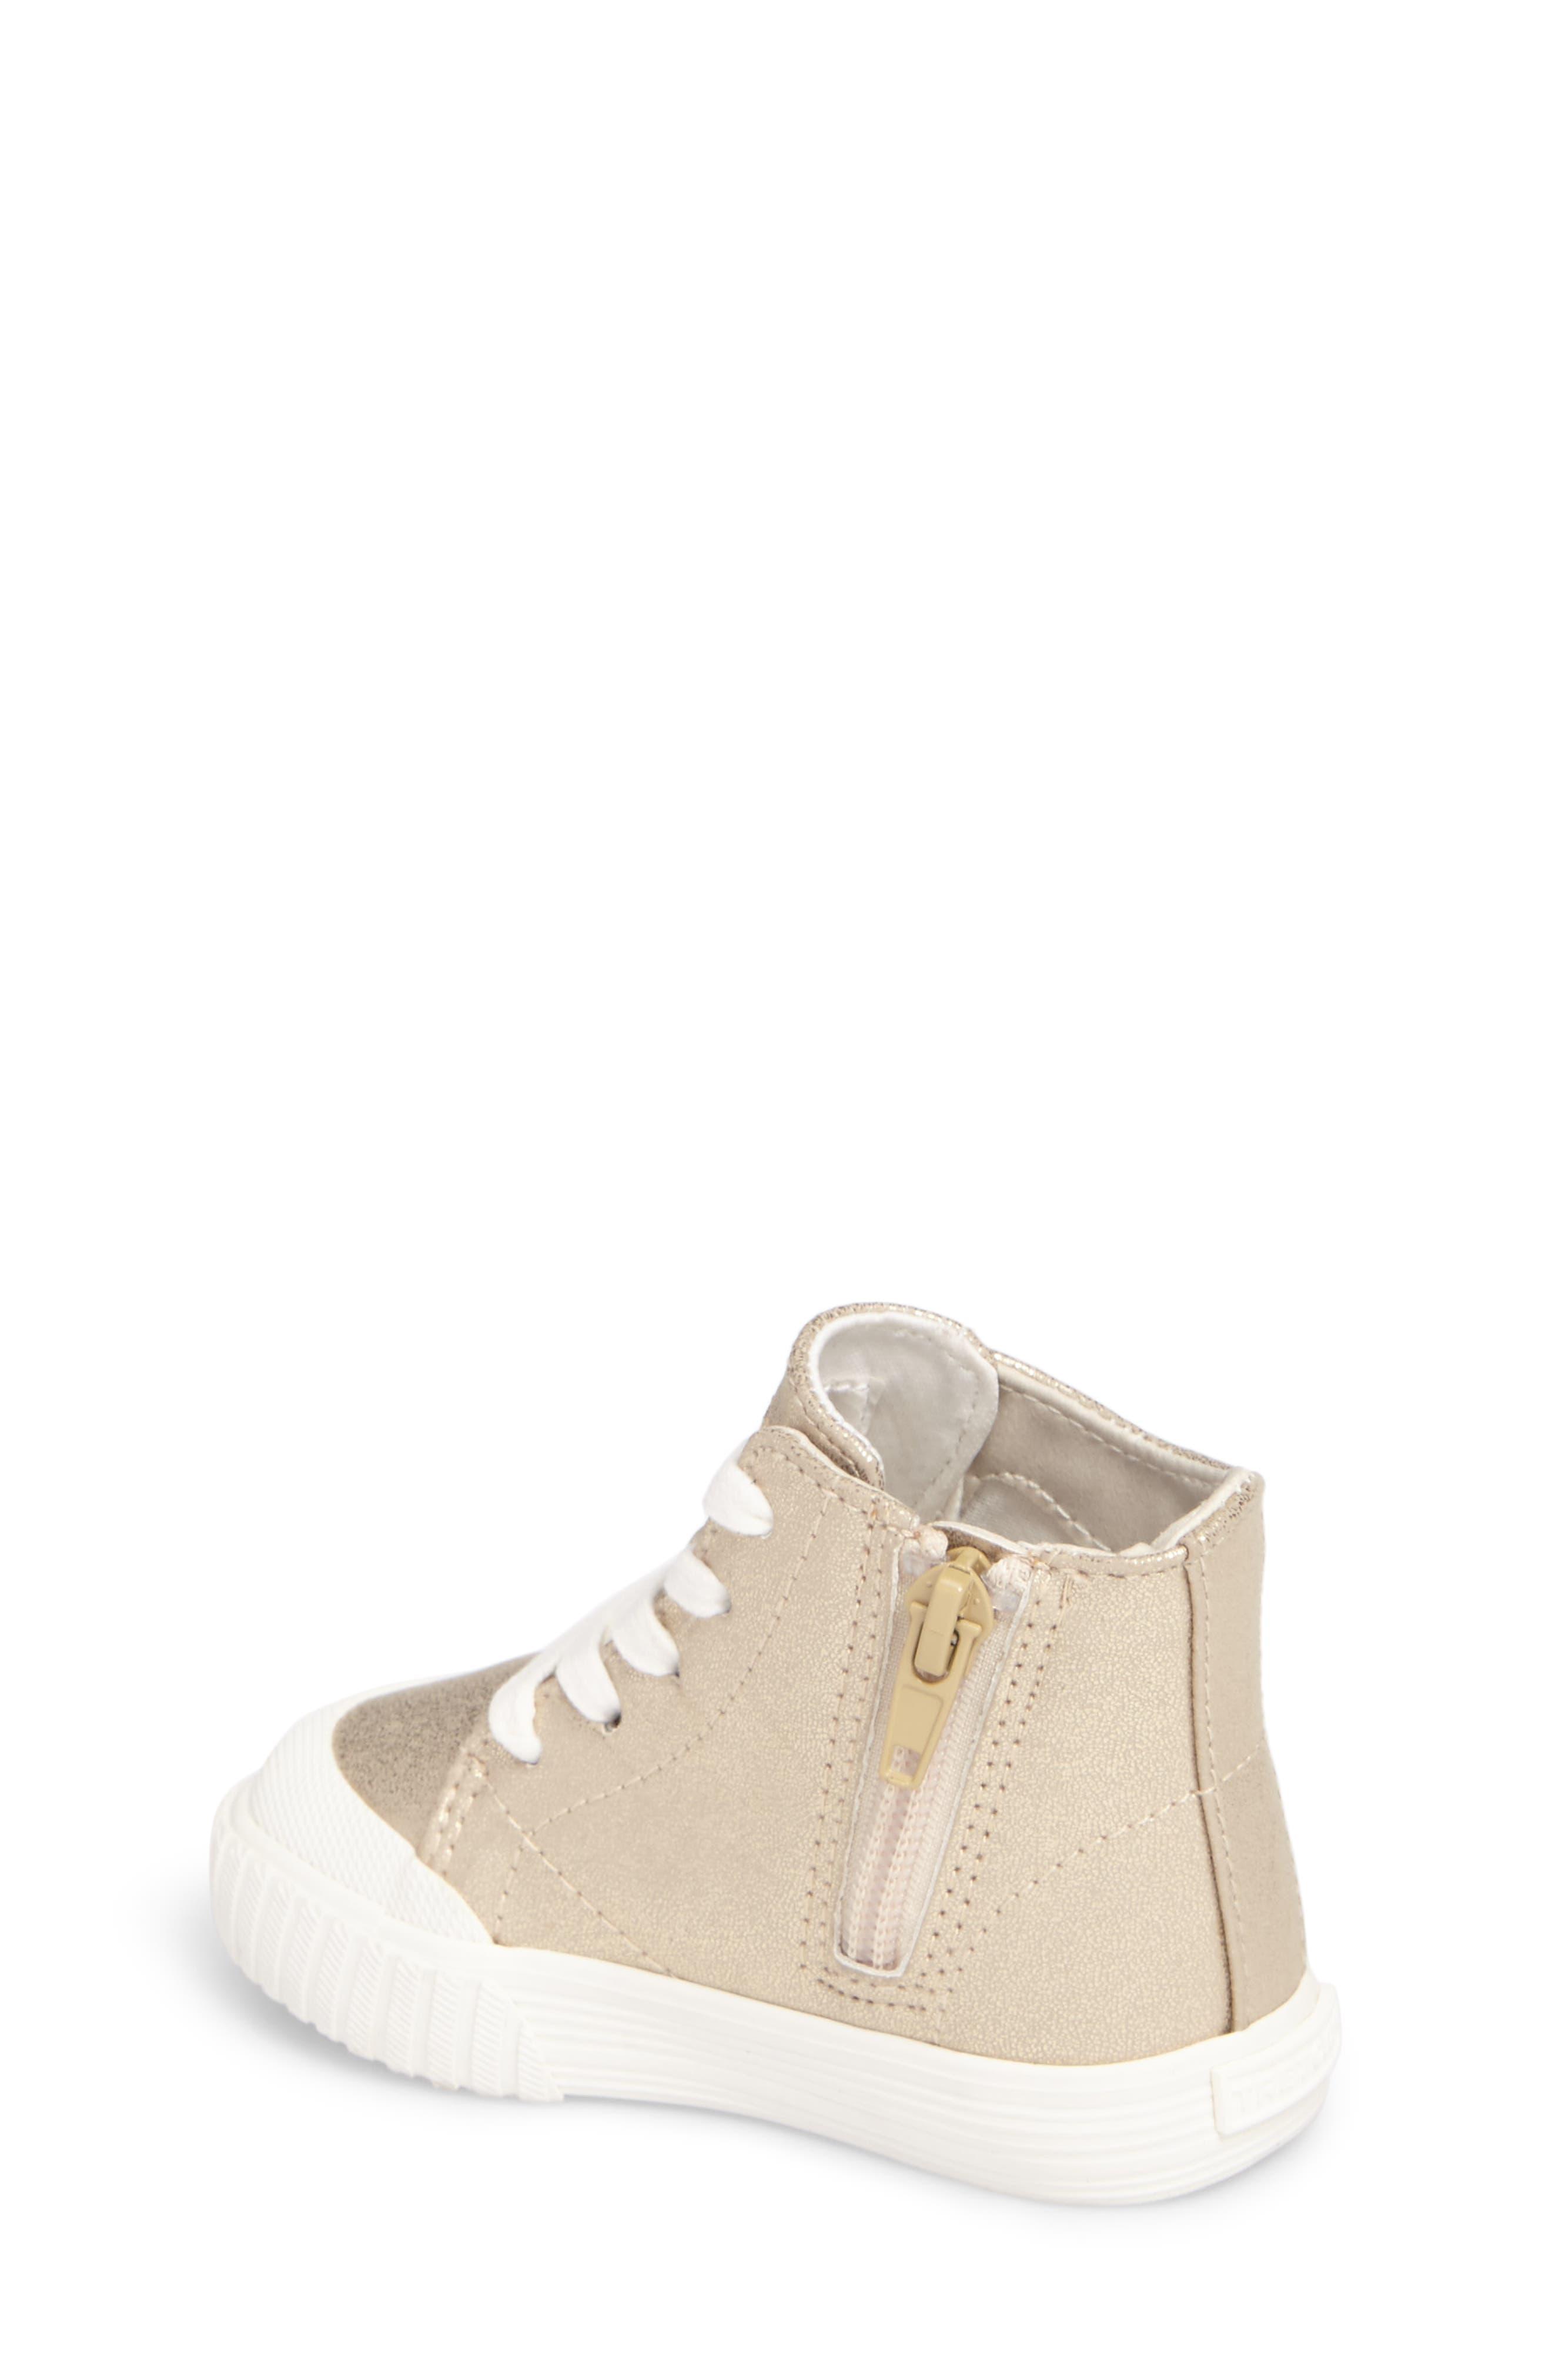 Marley High Top Sneaker,                             Alternate thumbnail 6, color,